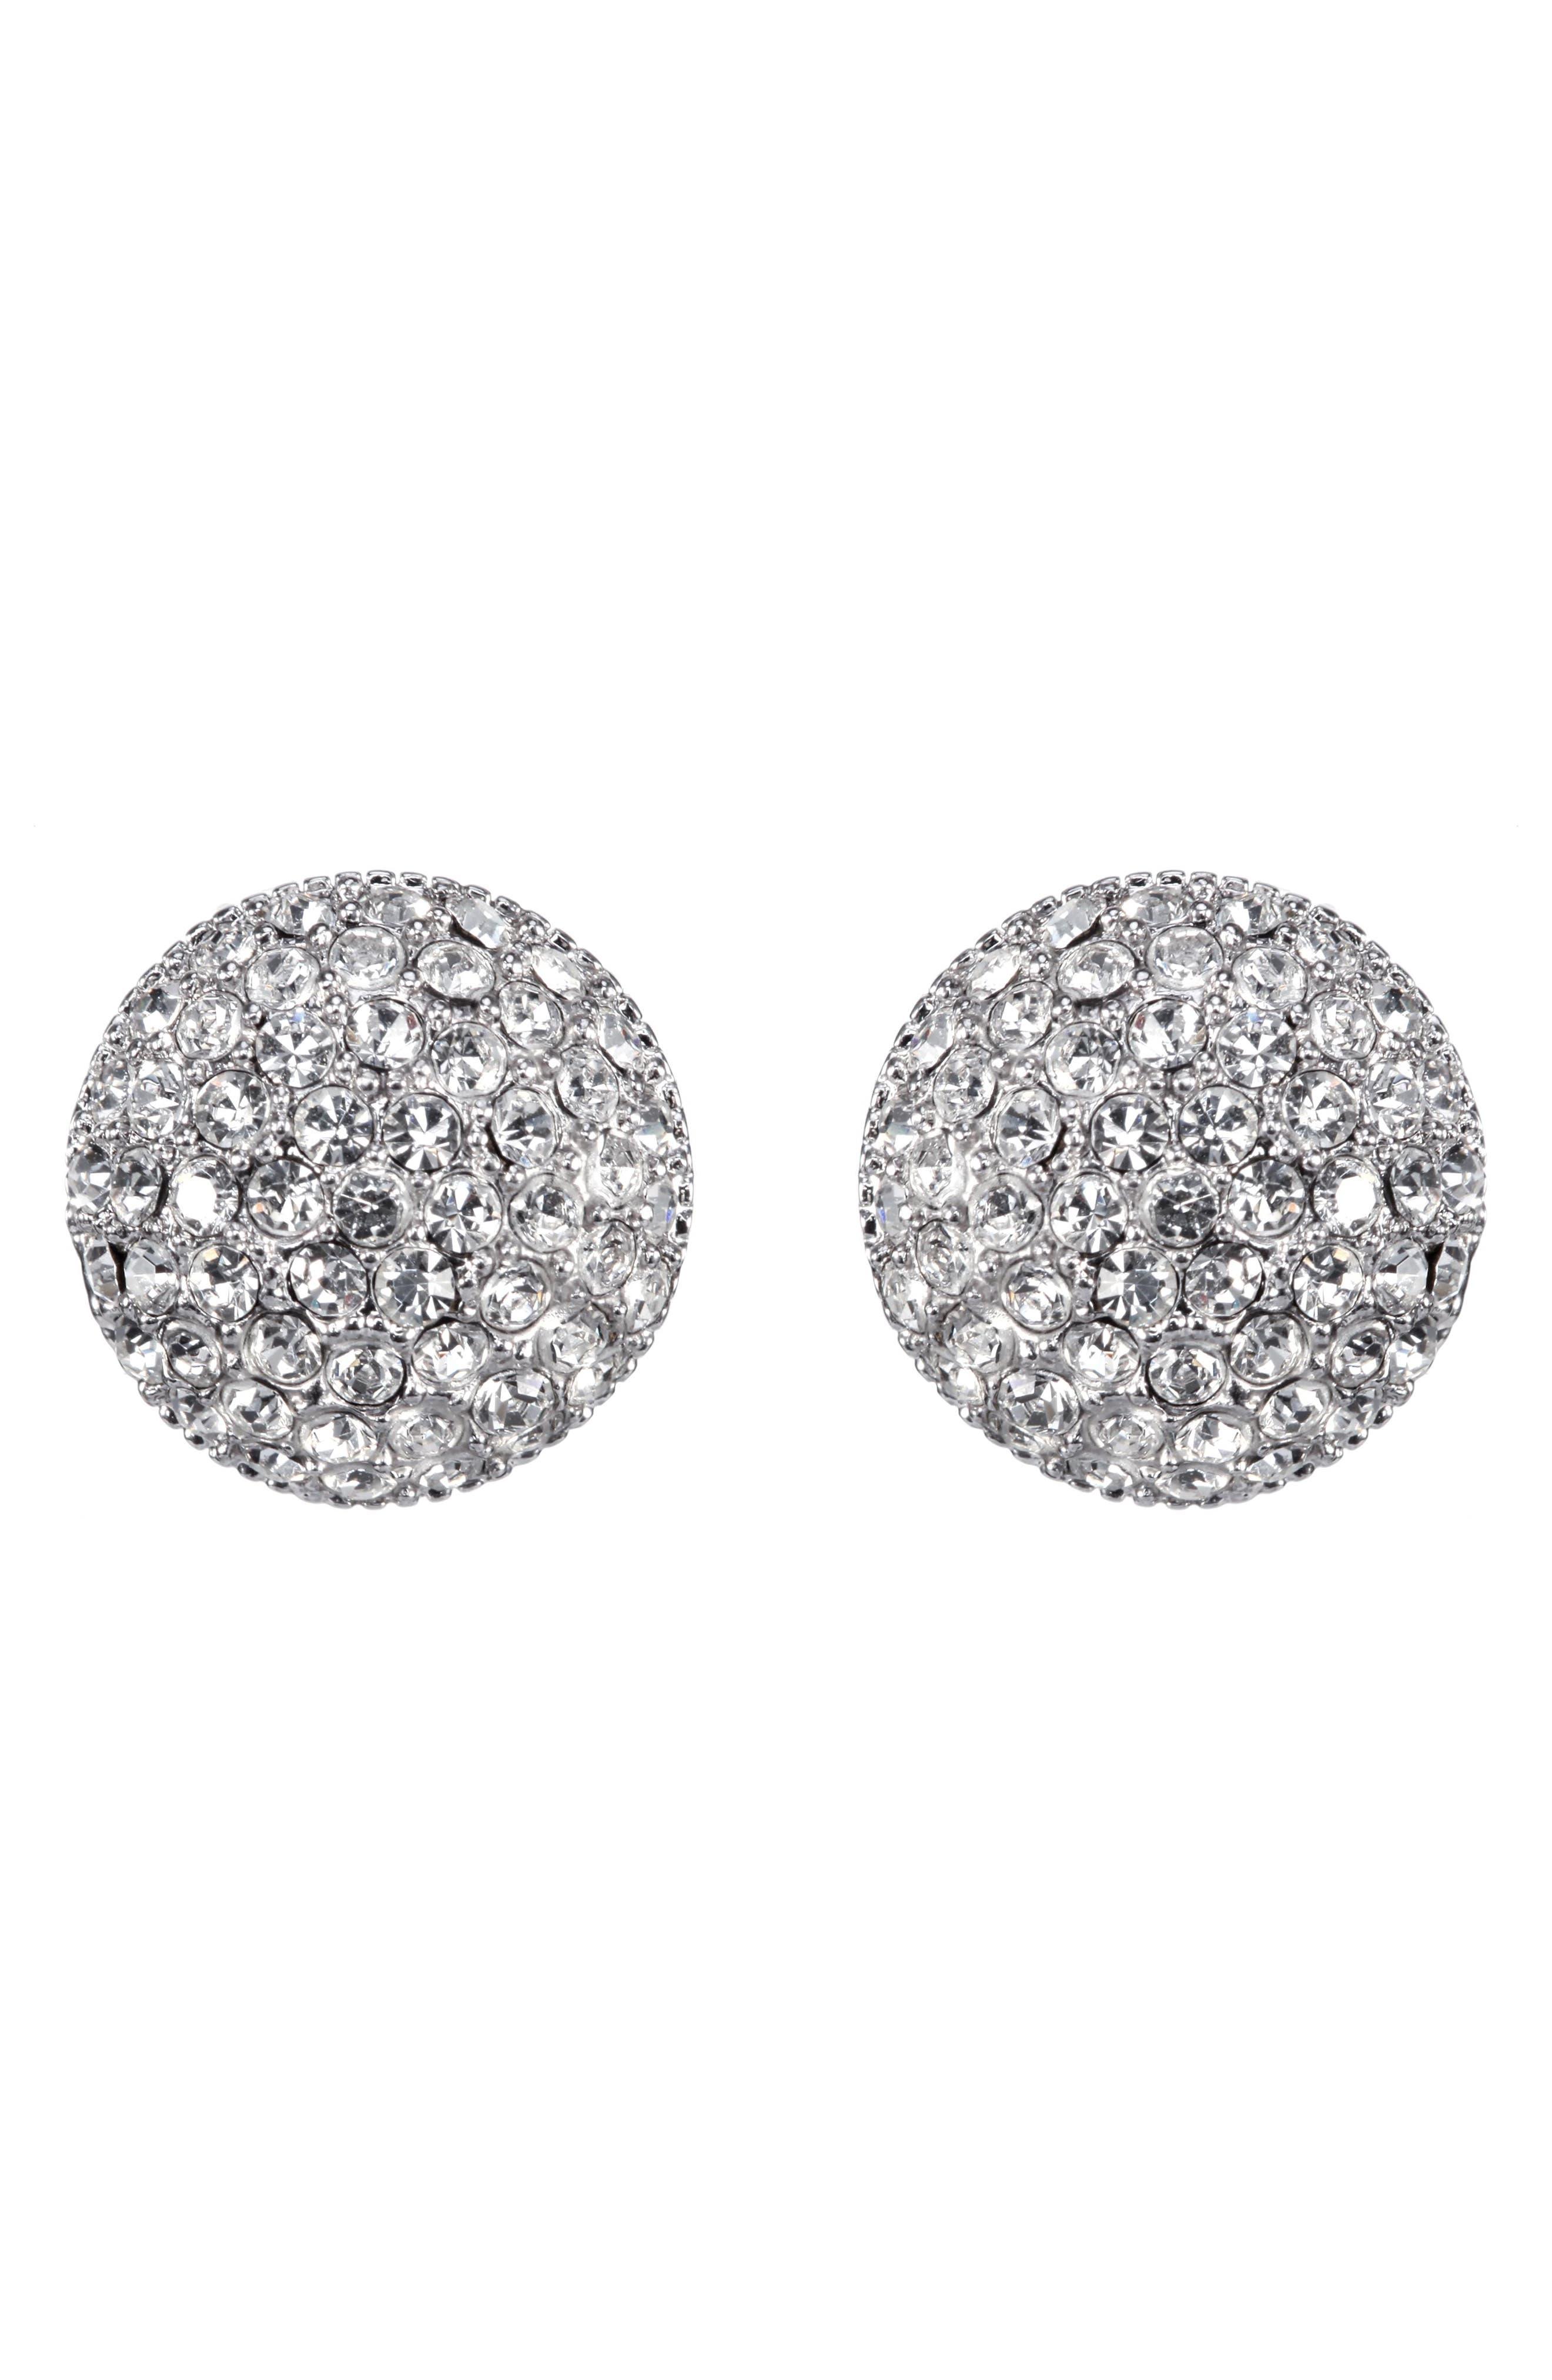 Small Pavé Swarovski Crystal Button Earrings,                             Main thumbnail 1, color,                             WHITE/ SILVER